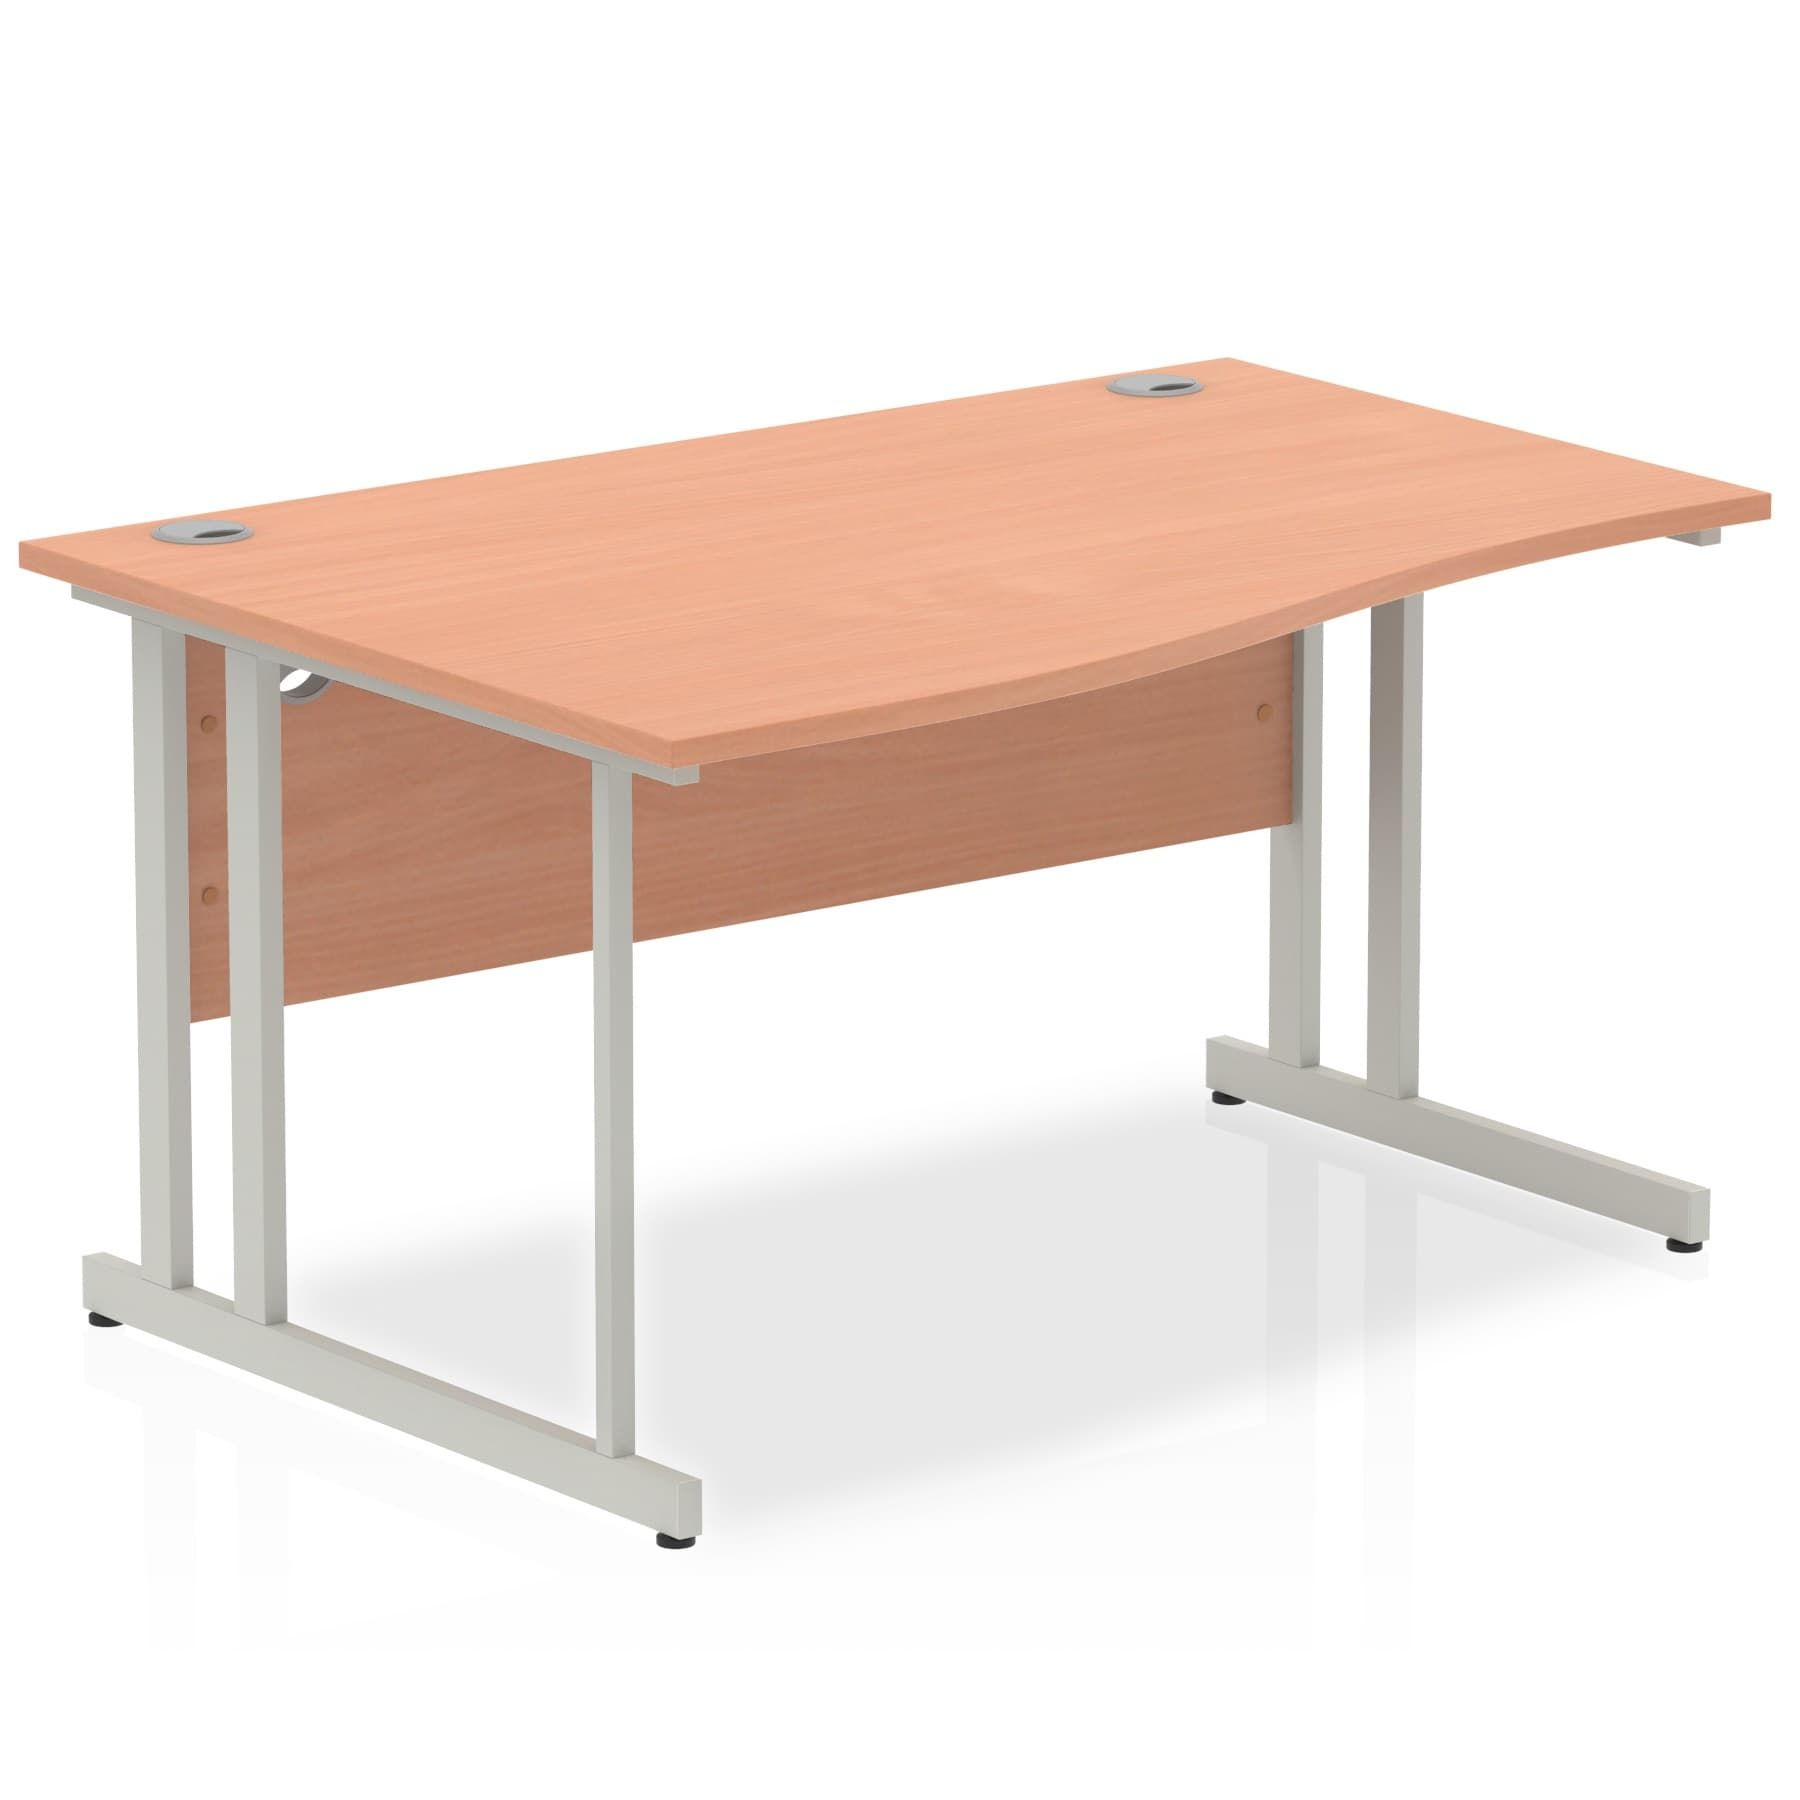 Impulse 1400 Left Hand Wave Desk with Cantilever Leg